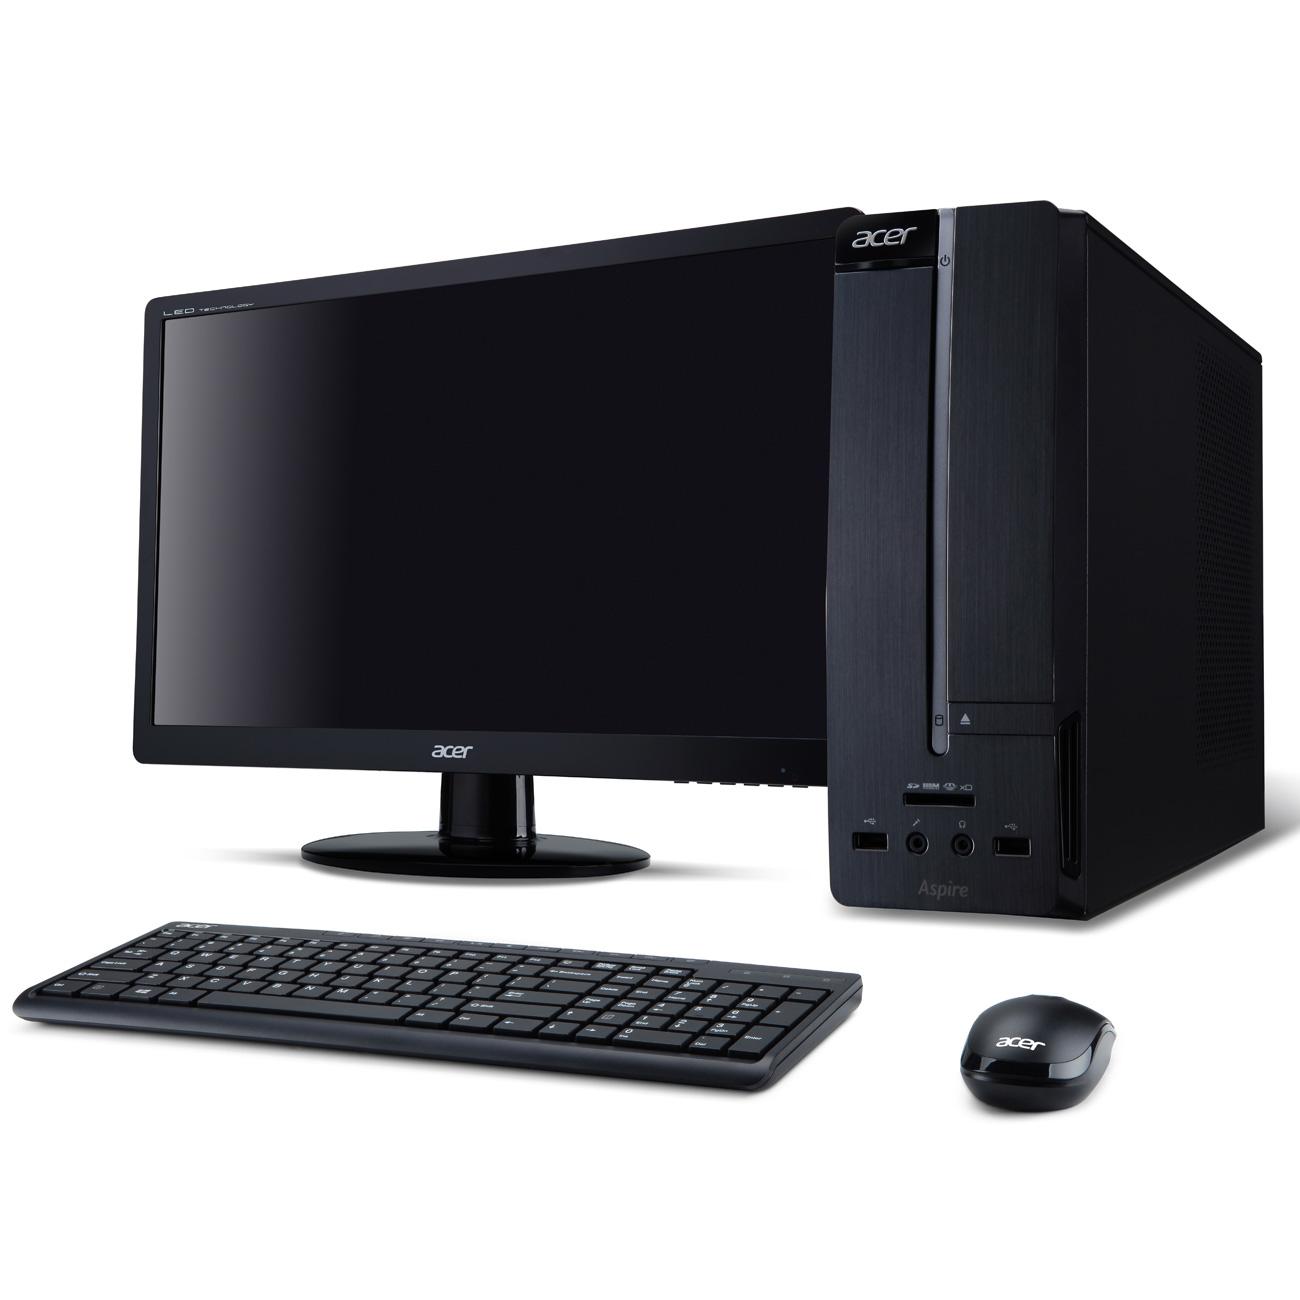 Acer Aspire Xc100 002 Pc De Bureau Acer Sur Ldlc Com